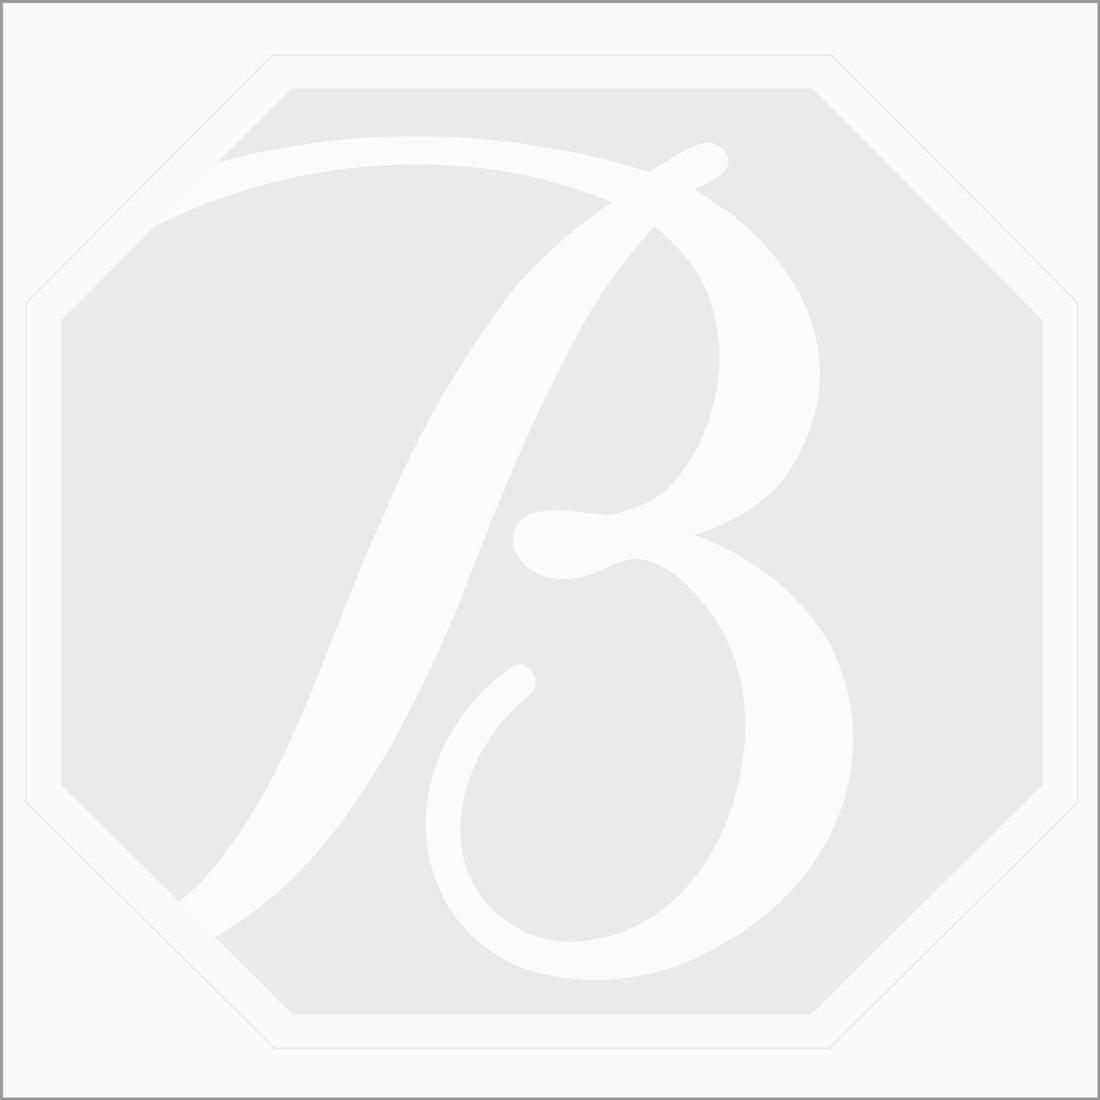 9 x 9 mm - Dark Maroon Rose Cut Diamond Cushion Shape - 5.57 carats (FncyDiaRC1013)